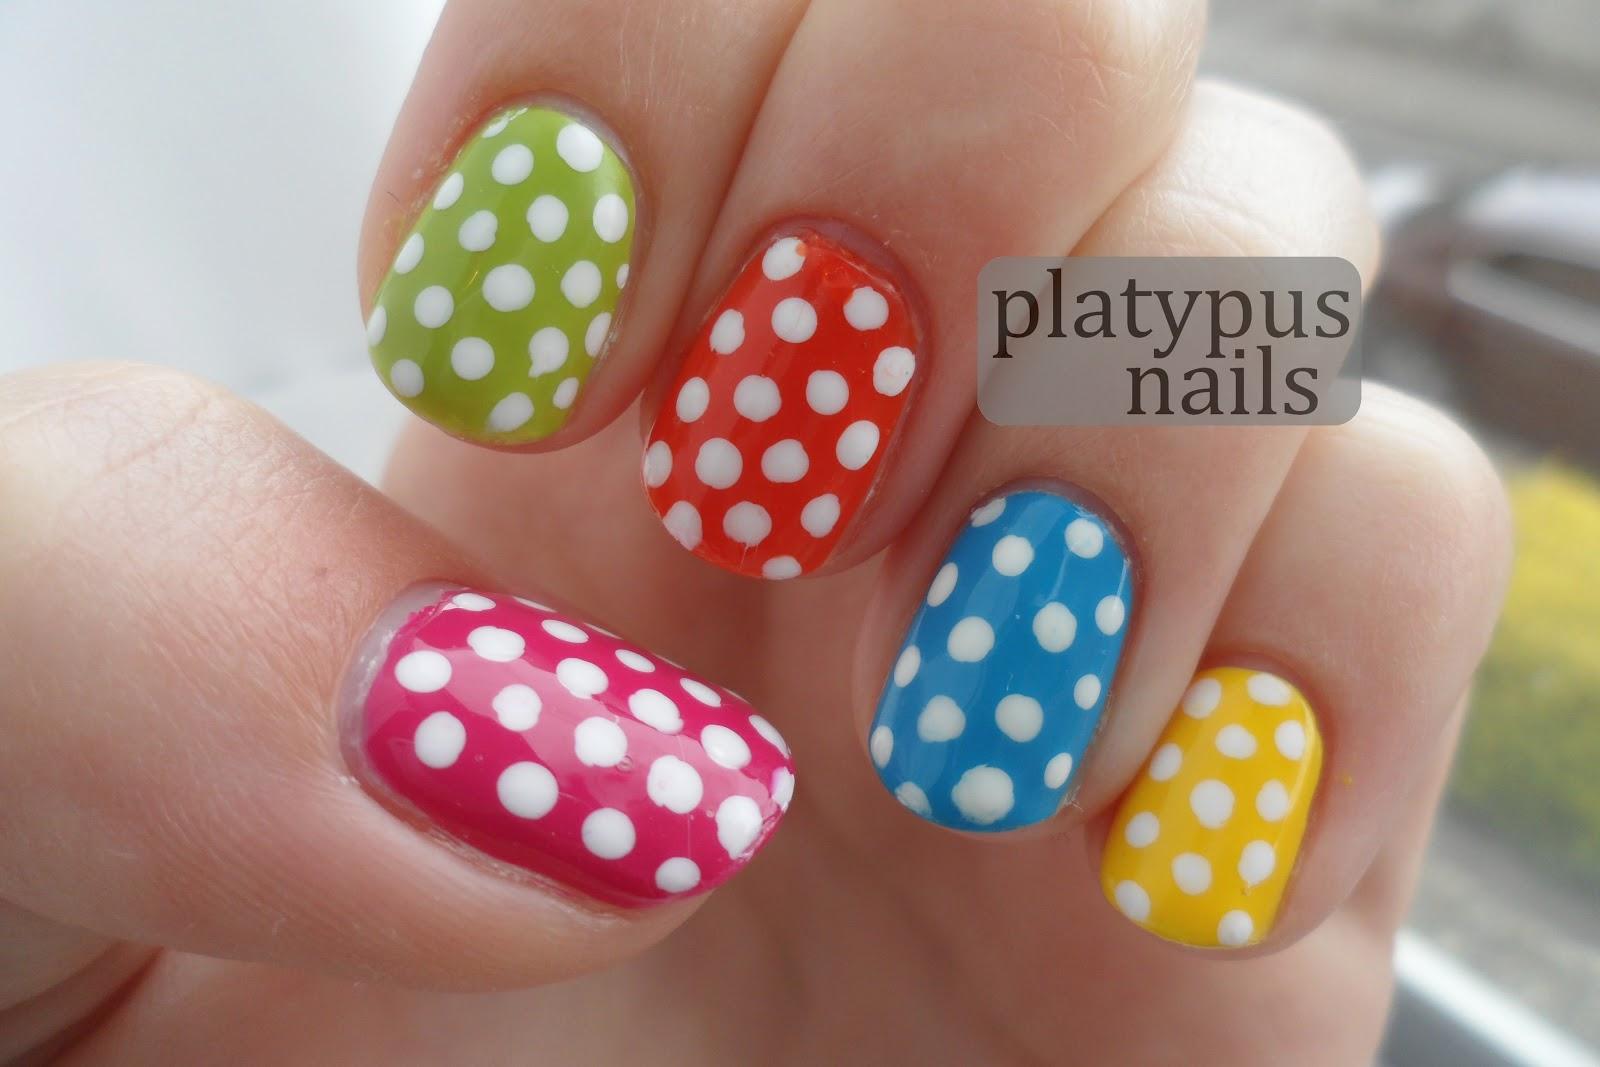 designs images polka dots - photo #33